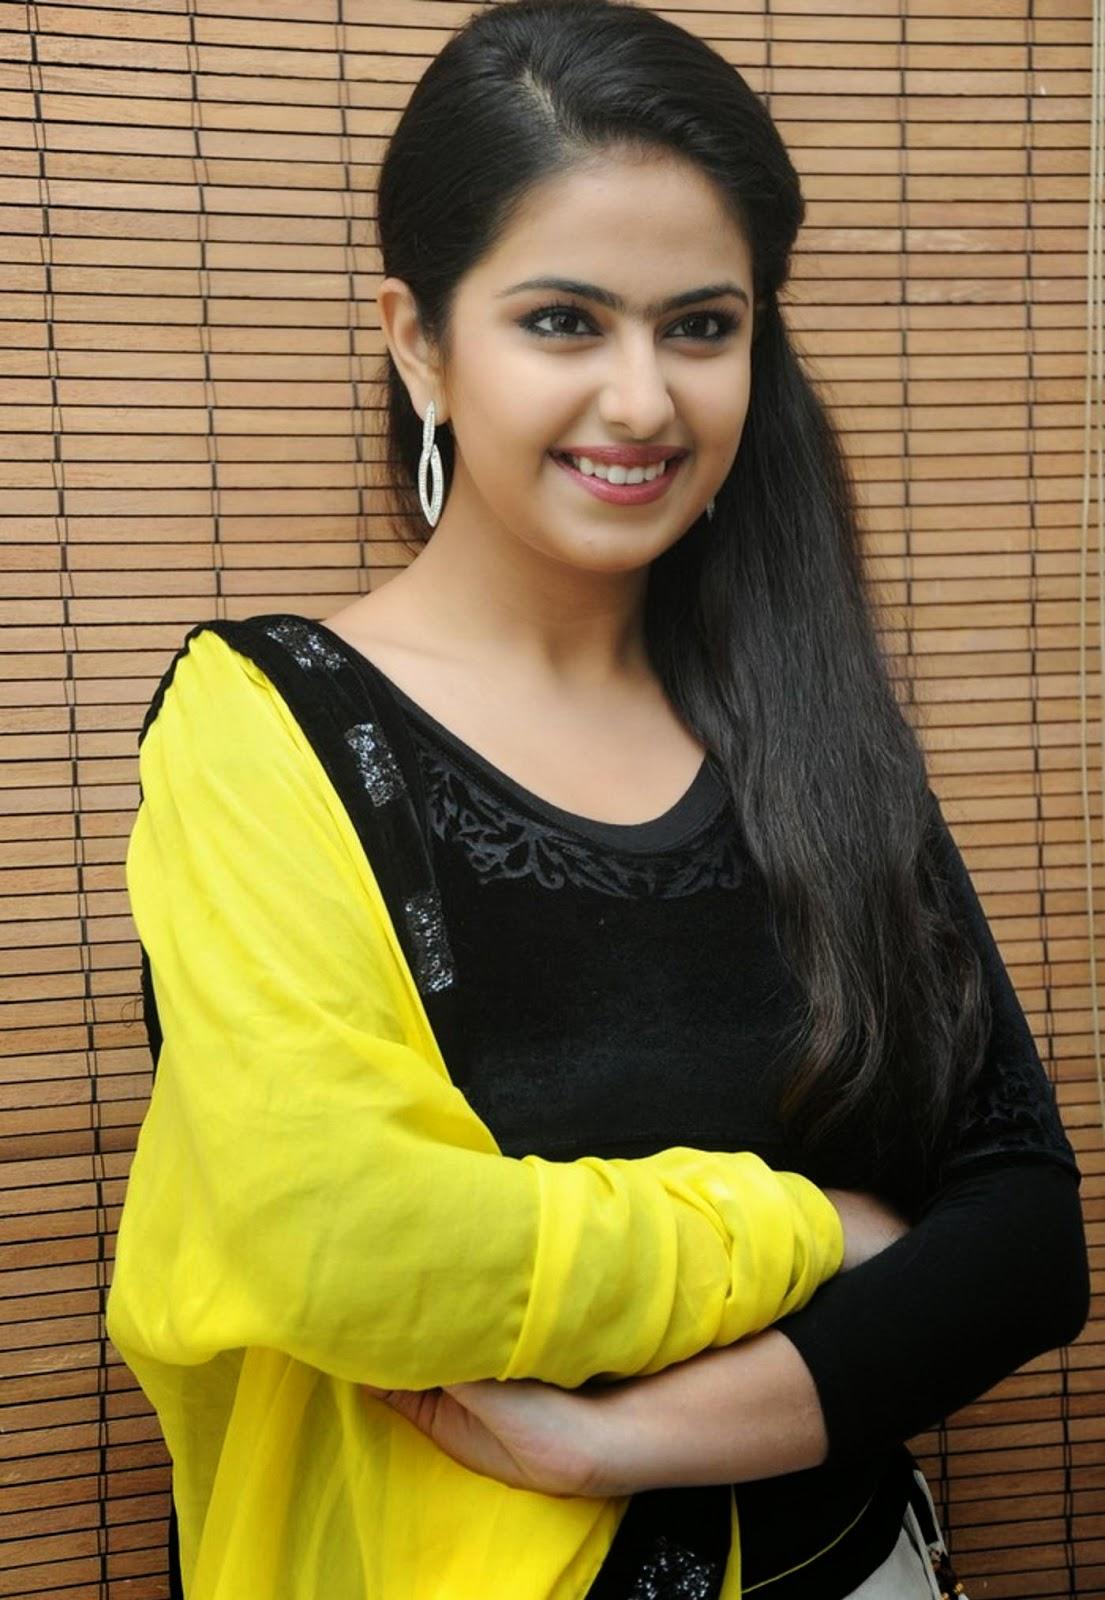 avika gor wallpapers free download uyyala jampala movie heroine 1619503 hd wallpaper backgrounds download uyyala jampala movie heroine